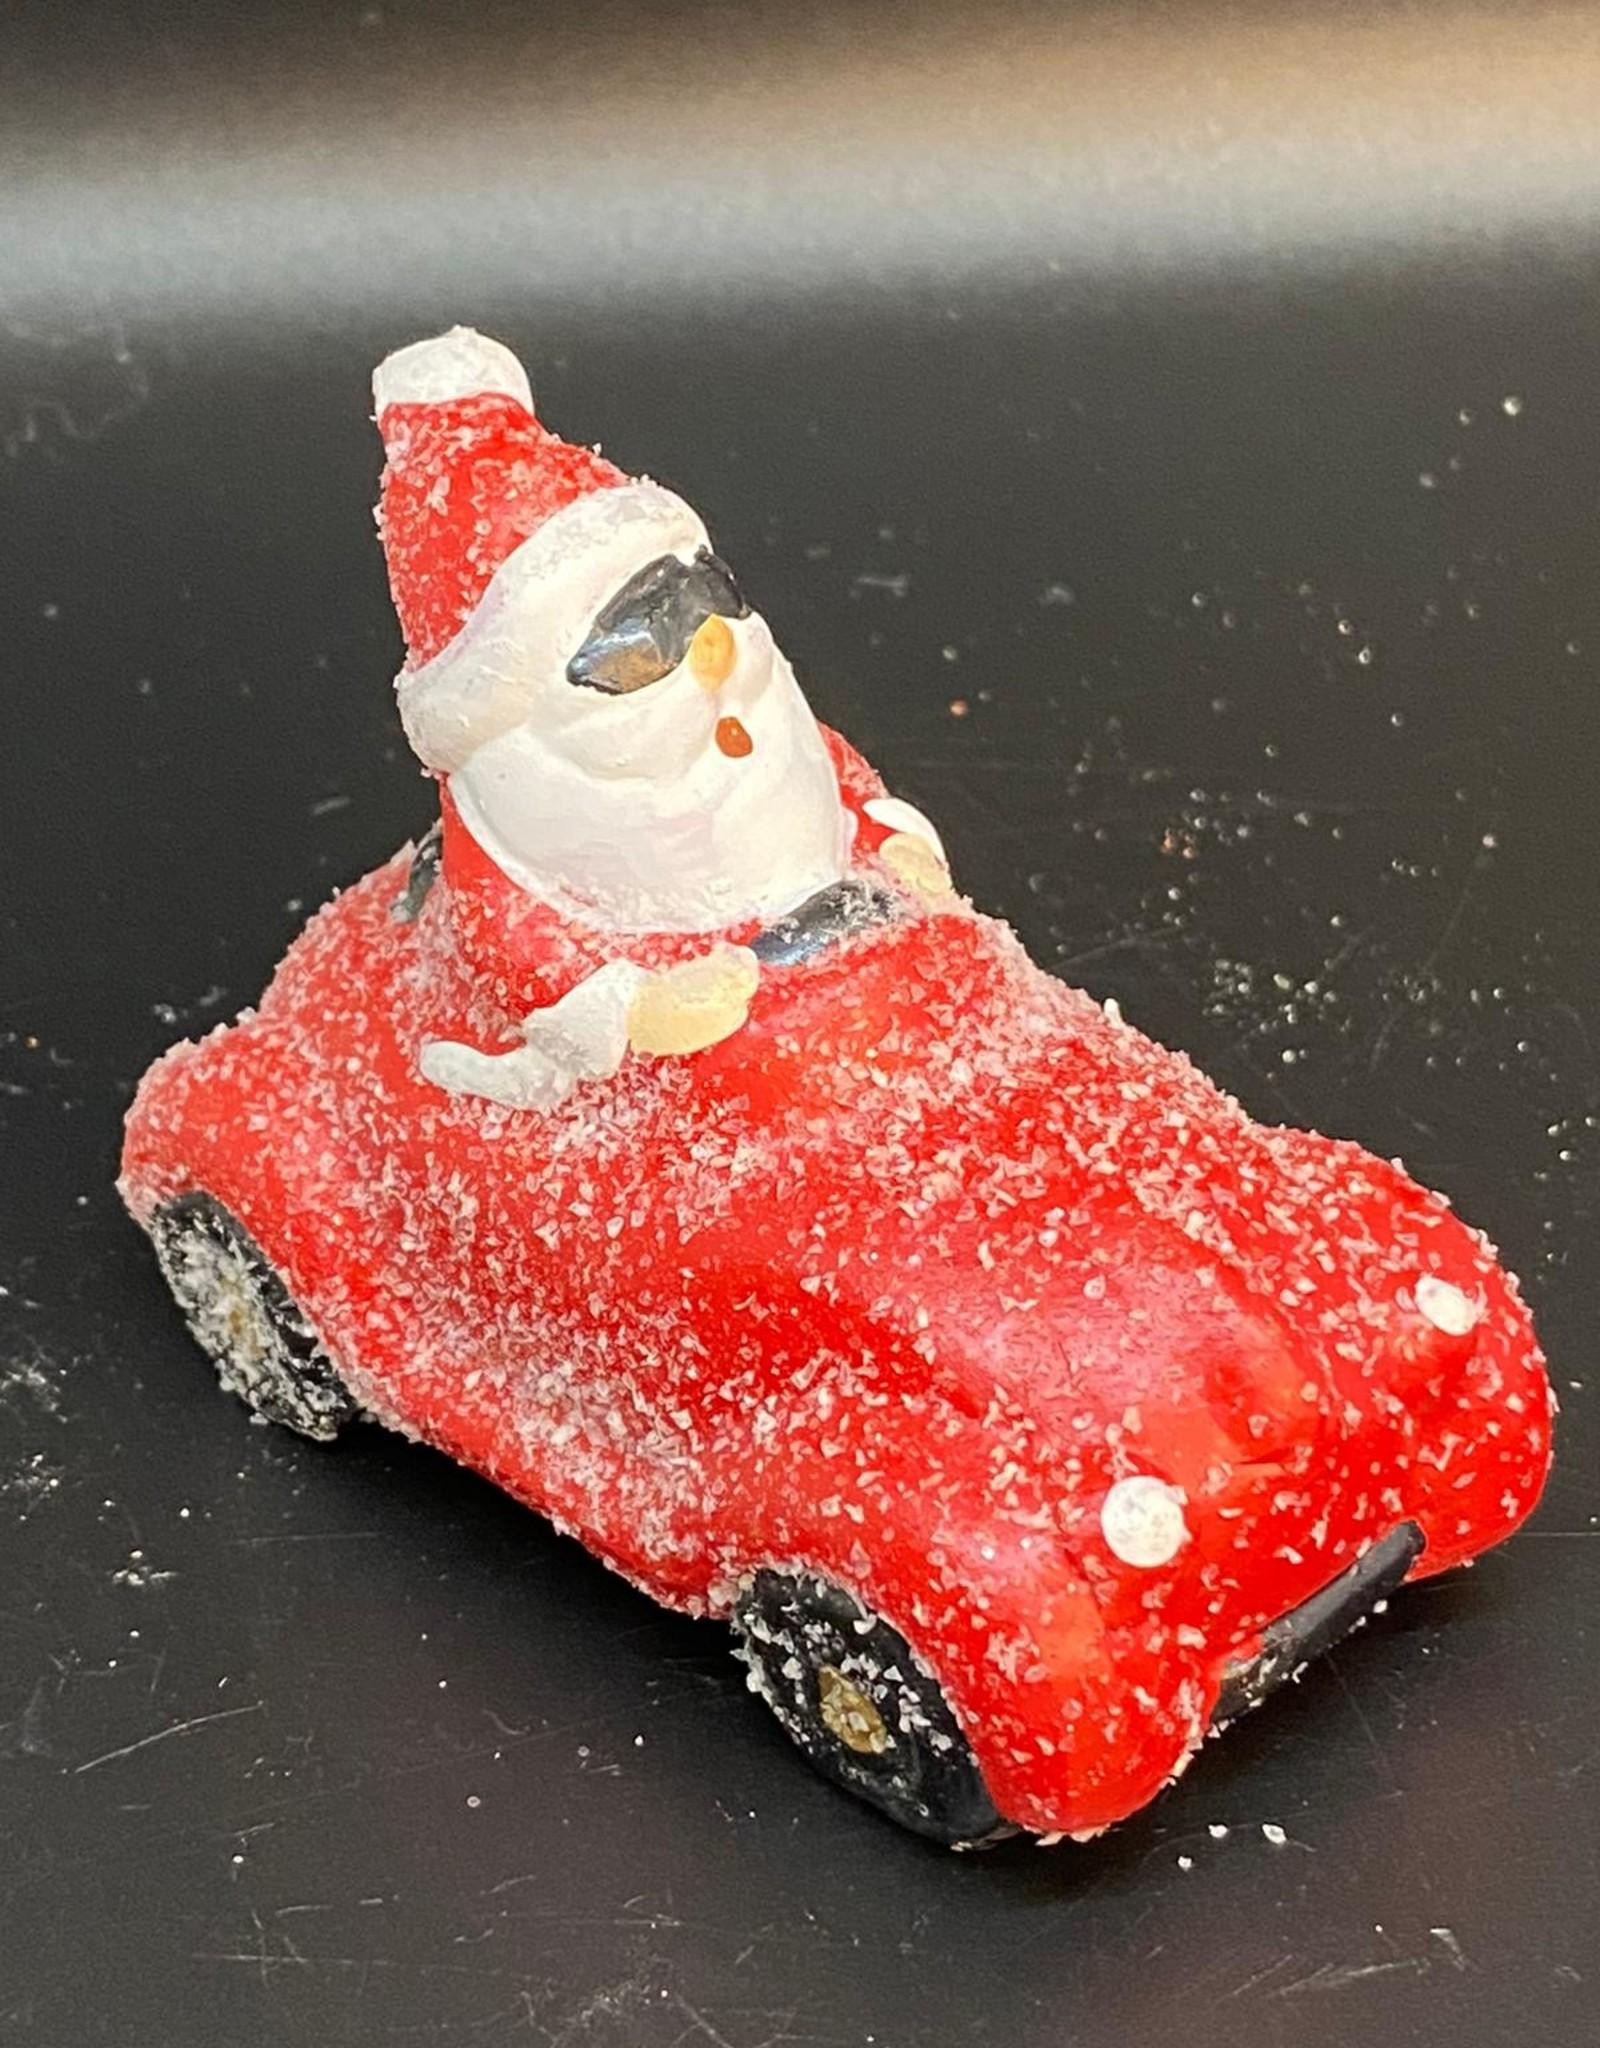 Coole kerstman in auto